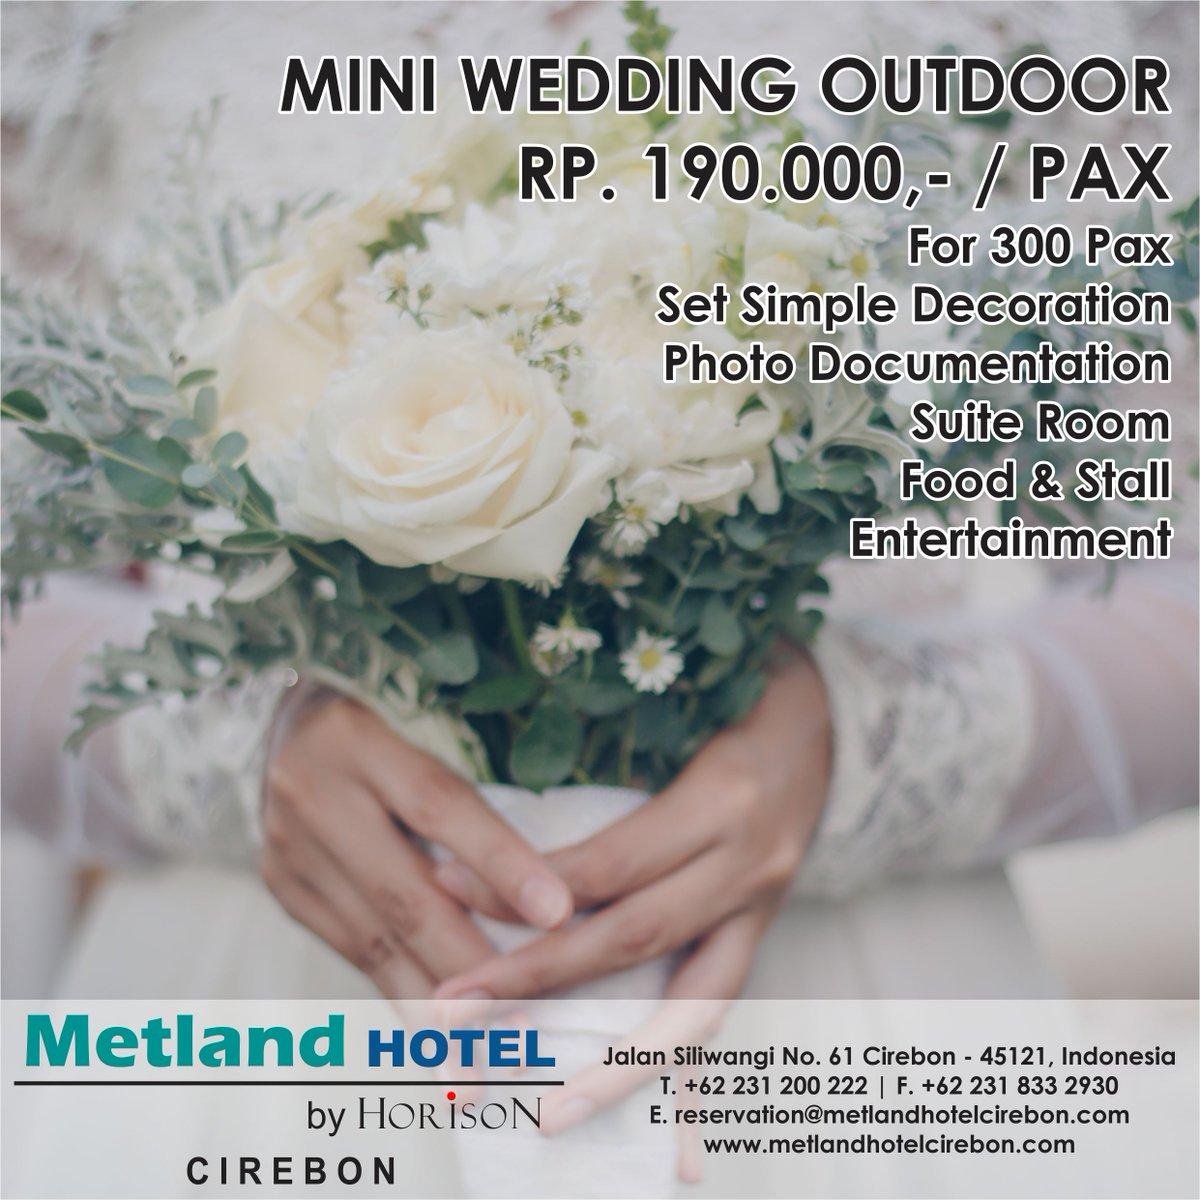 Metlandhotel Cirebon Ar Twitter Berencana Melaksanakan Wedding Garden Party Metland Hotel Cirebon By Horison Menyediakan Berbagi Paket Sesuai Dengan Kebutuhan Anda Https T Co Mvik1nfpqw